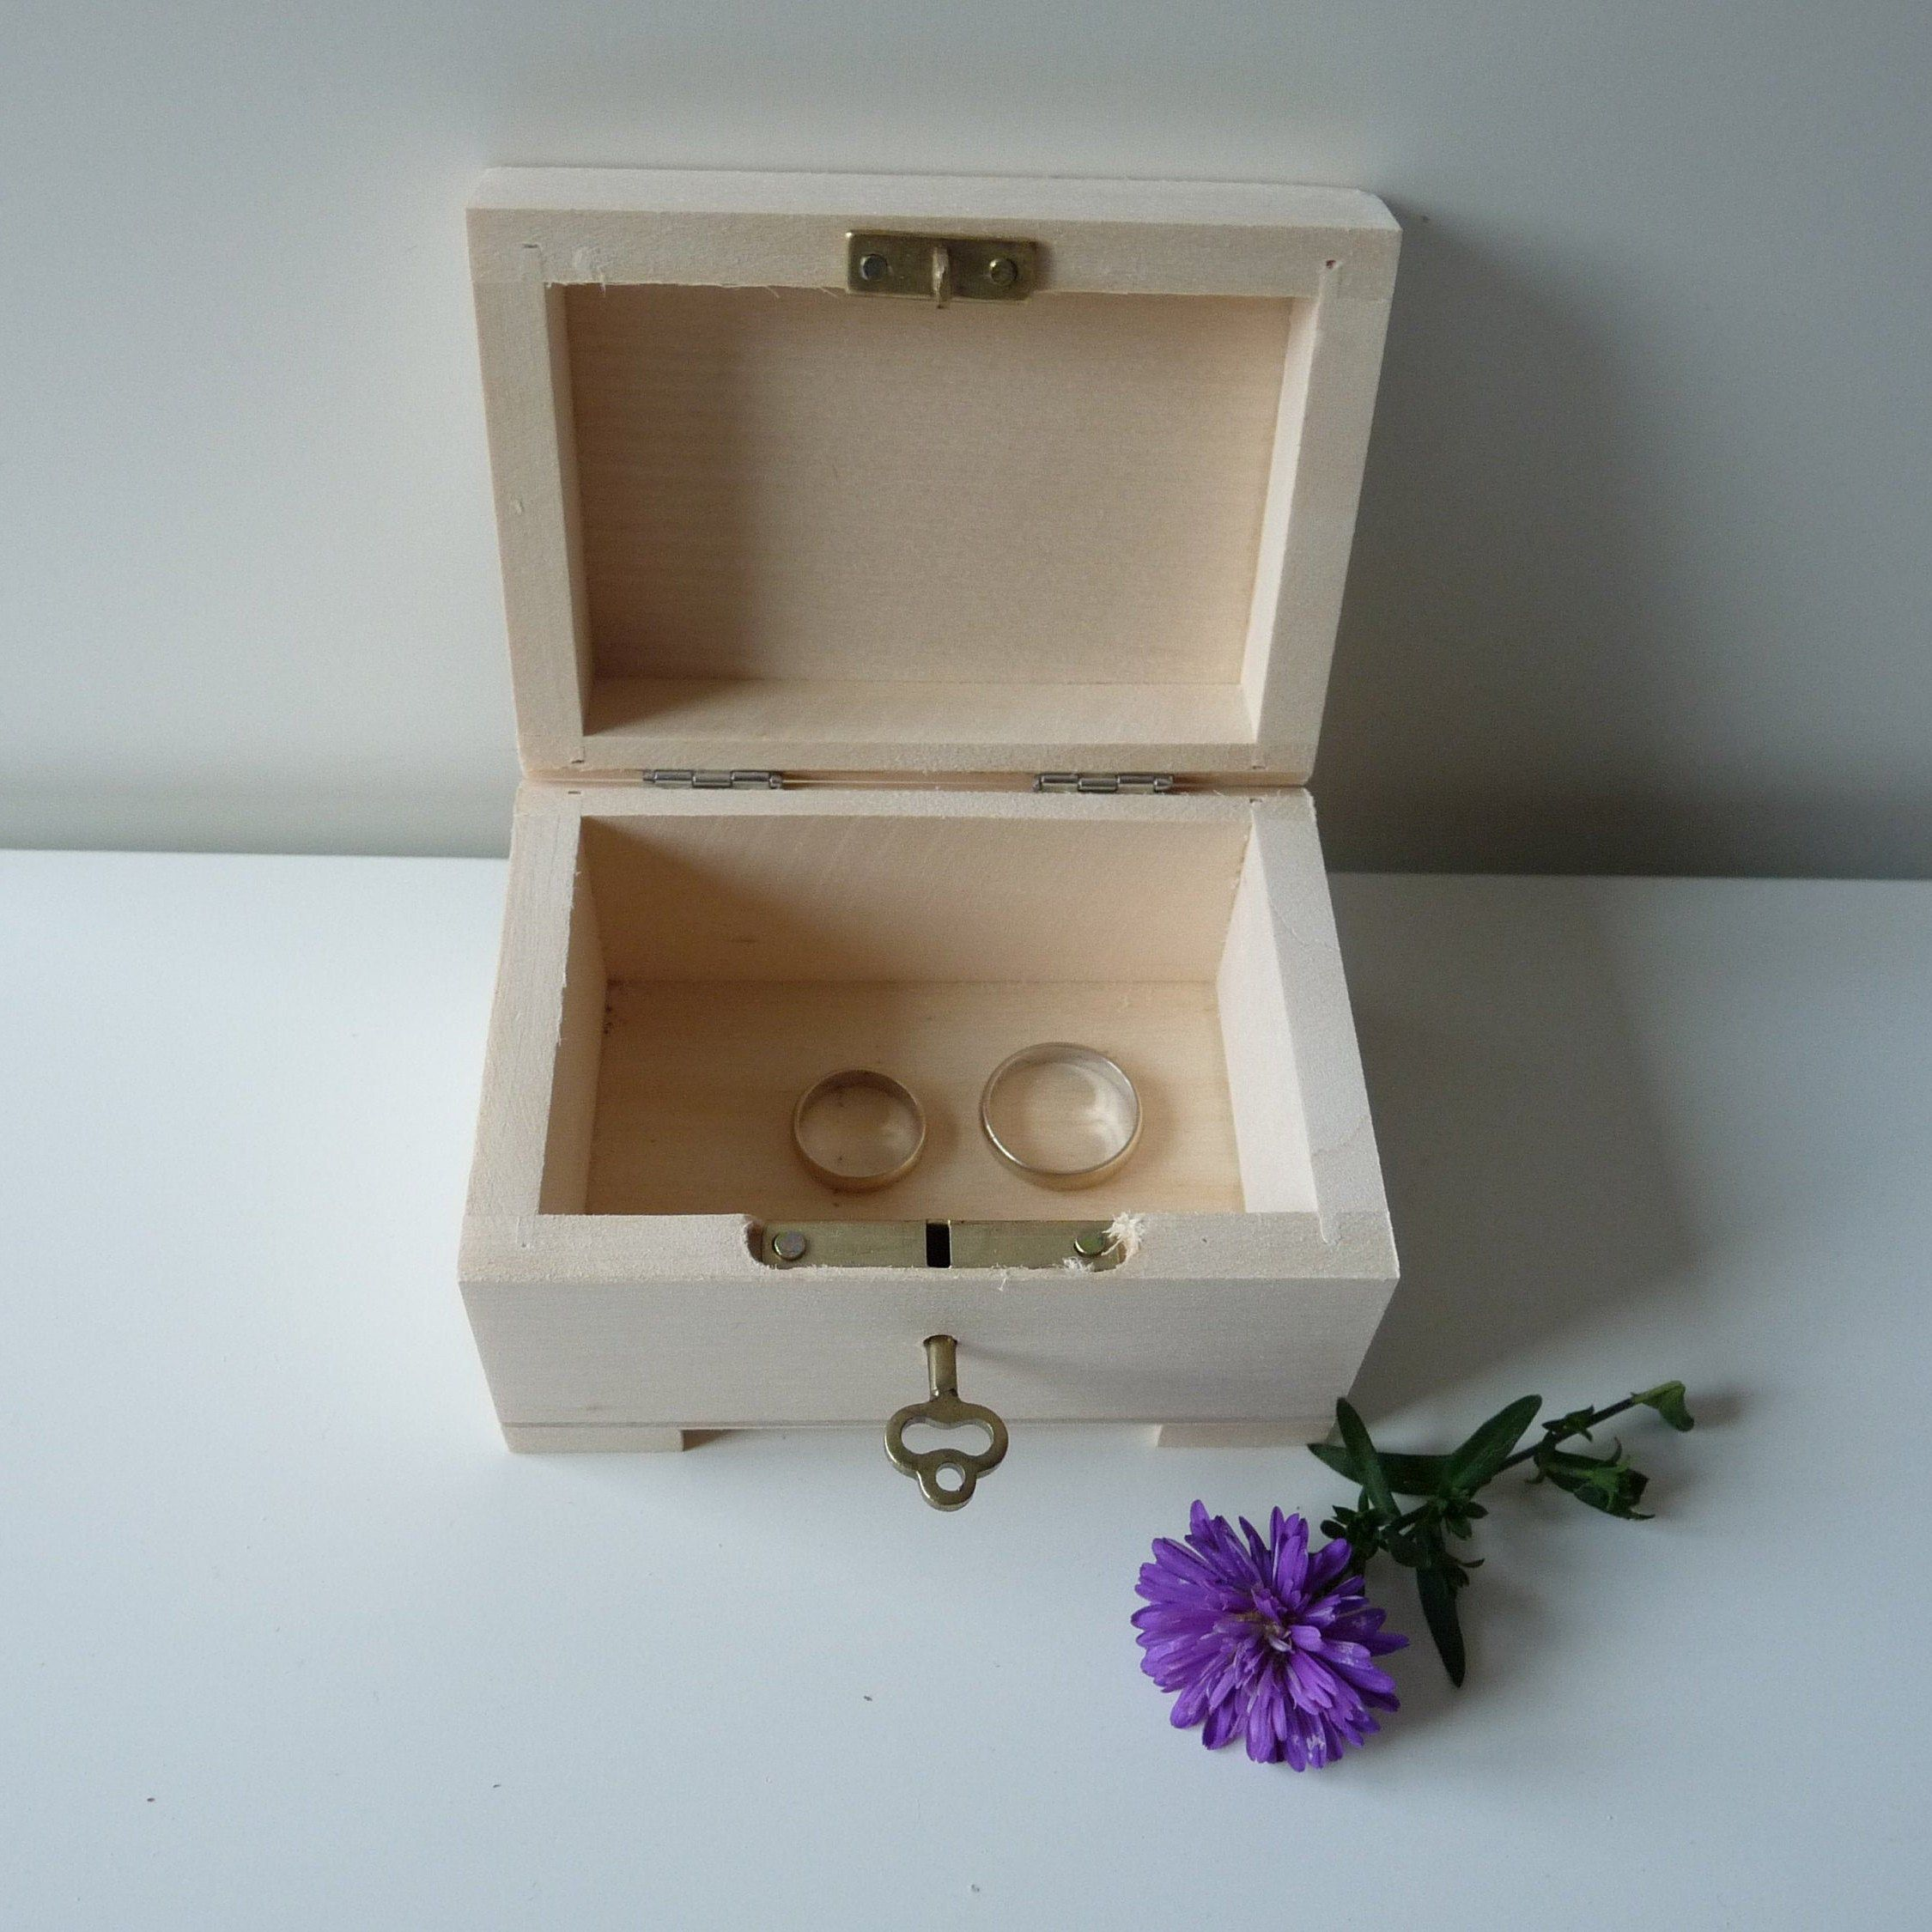 Wooden Wedding Ring Box With Key Lock Unfinished Wooden Treasure Chest With Key Unfinished Jewel Wooden Ring Box Wedding Wooden Wedding Ring Wedding Ring Box